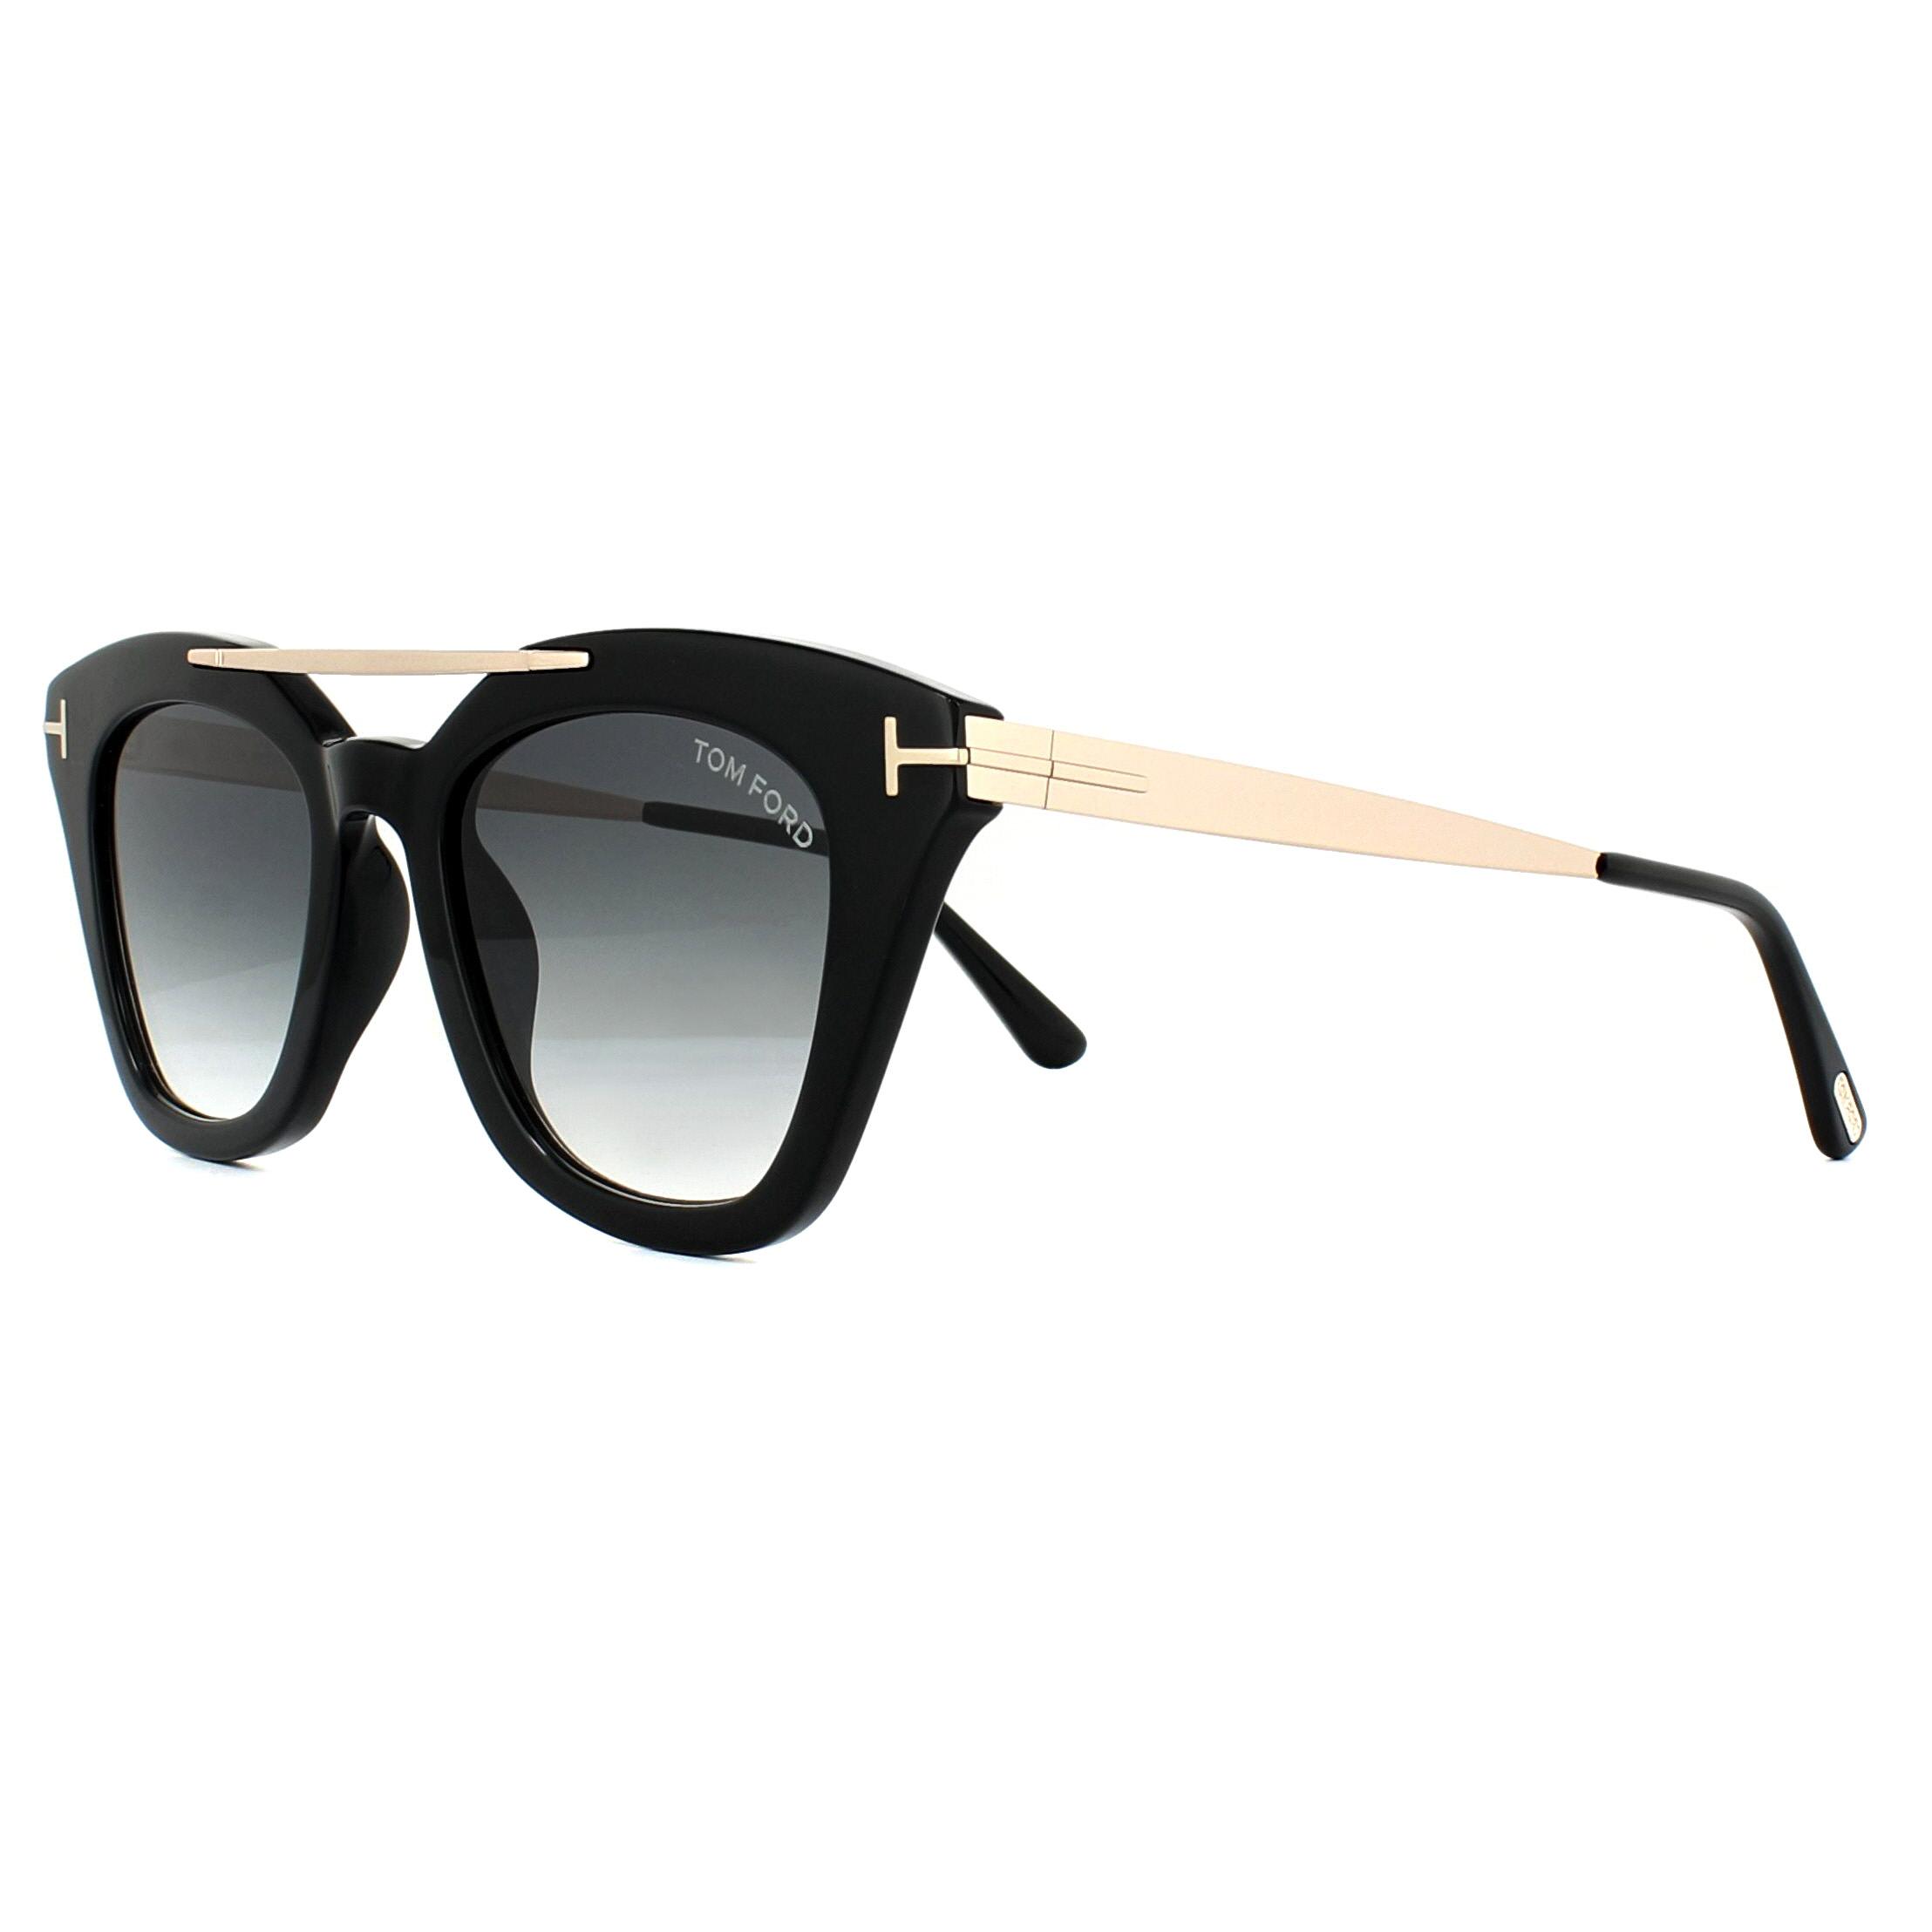 beb52ac8b029b Cheap Tom Ford 0575 Anna Sunglasses - Discounted Sunglasses